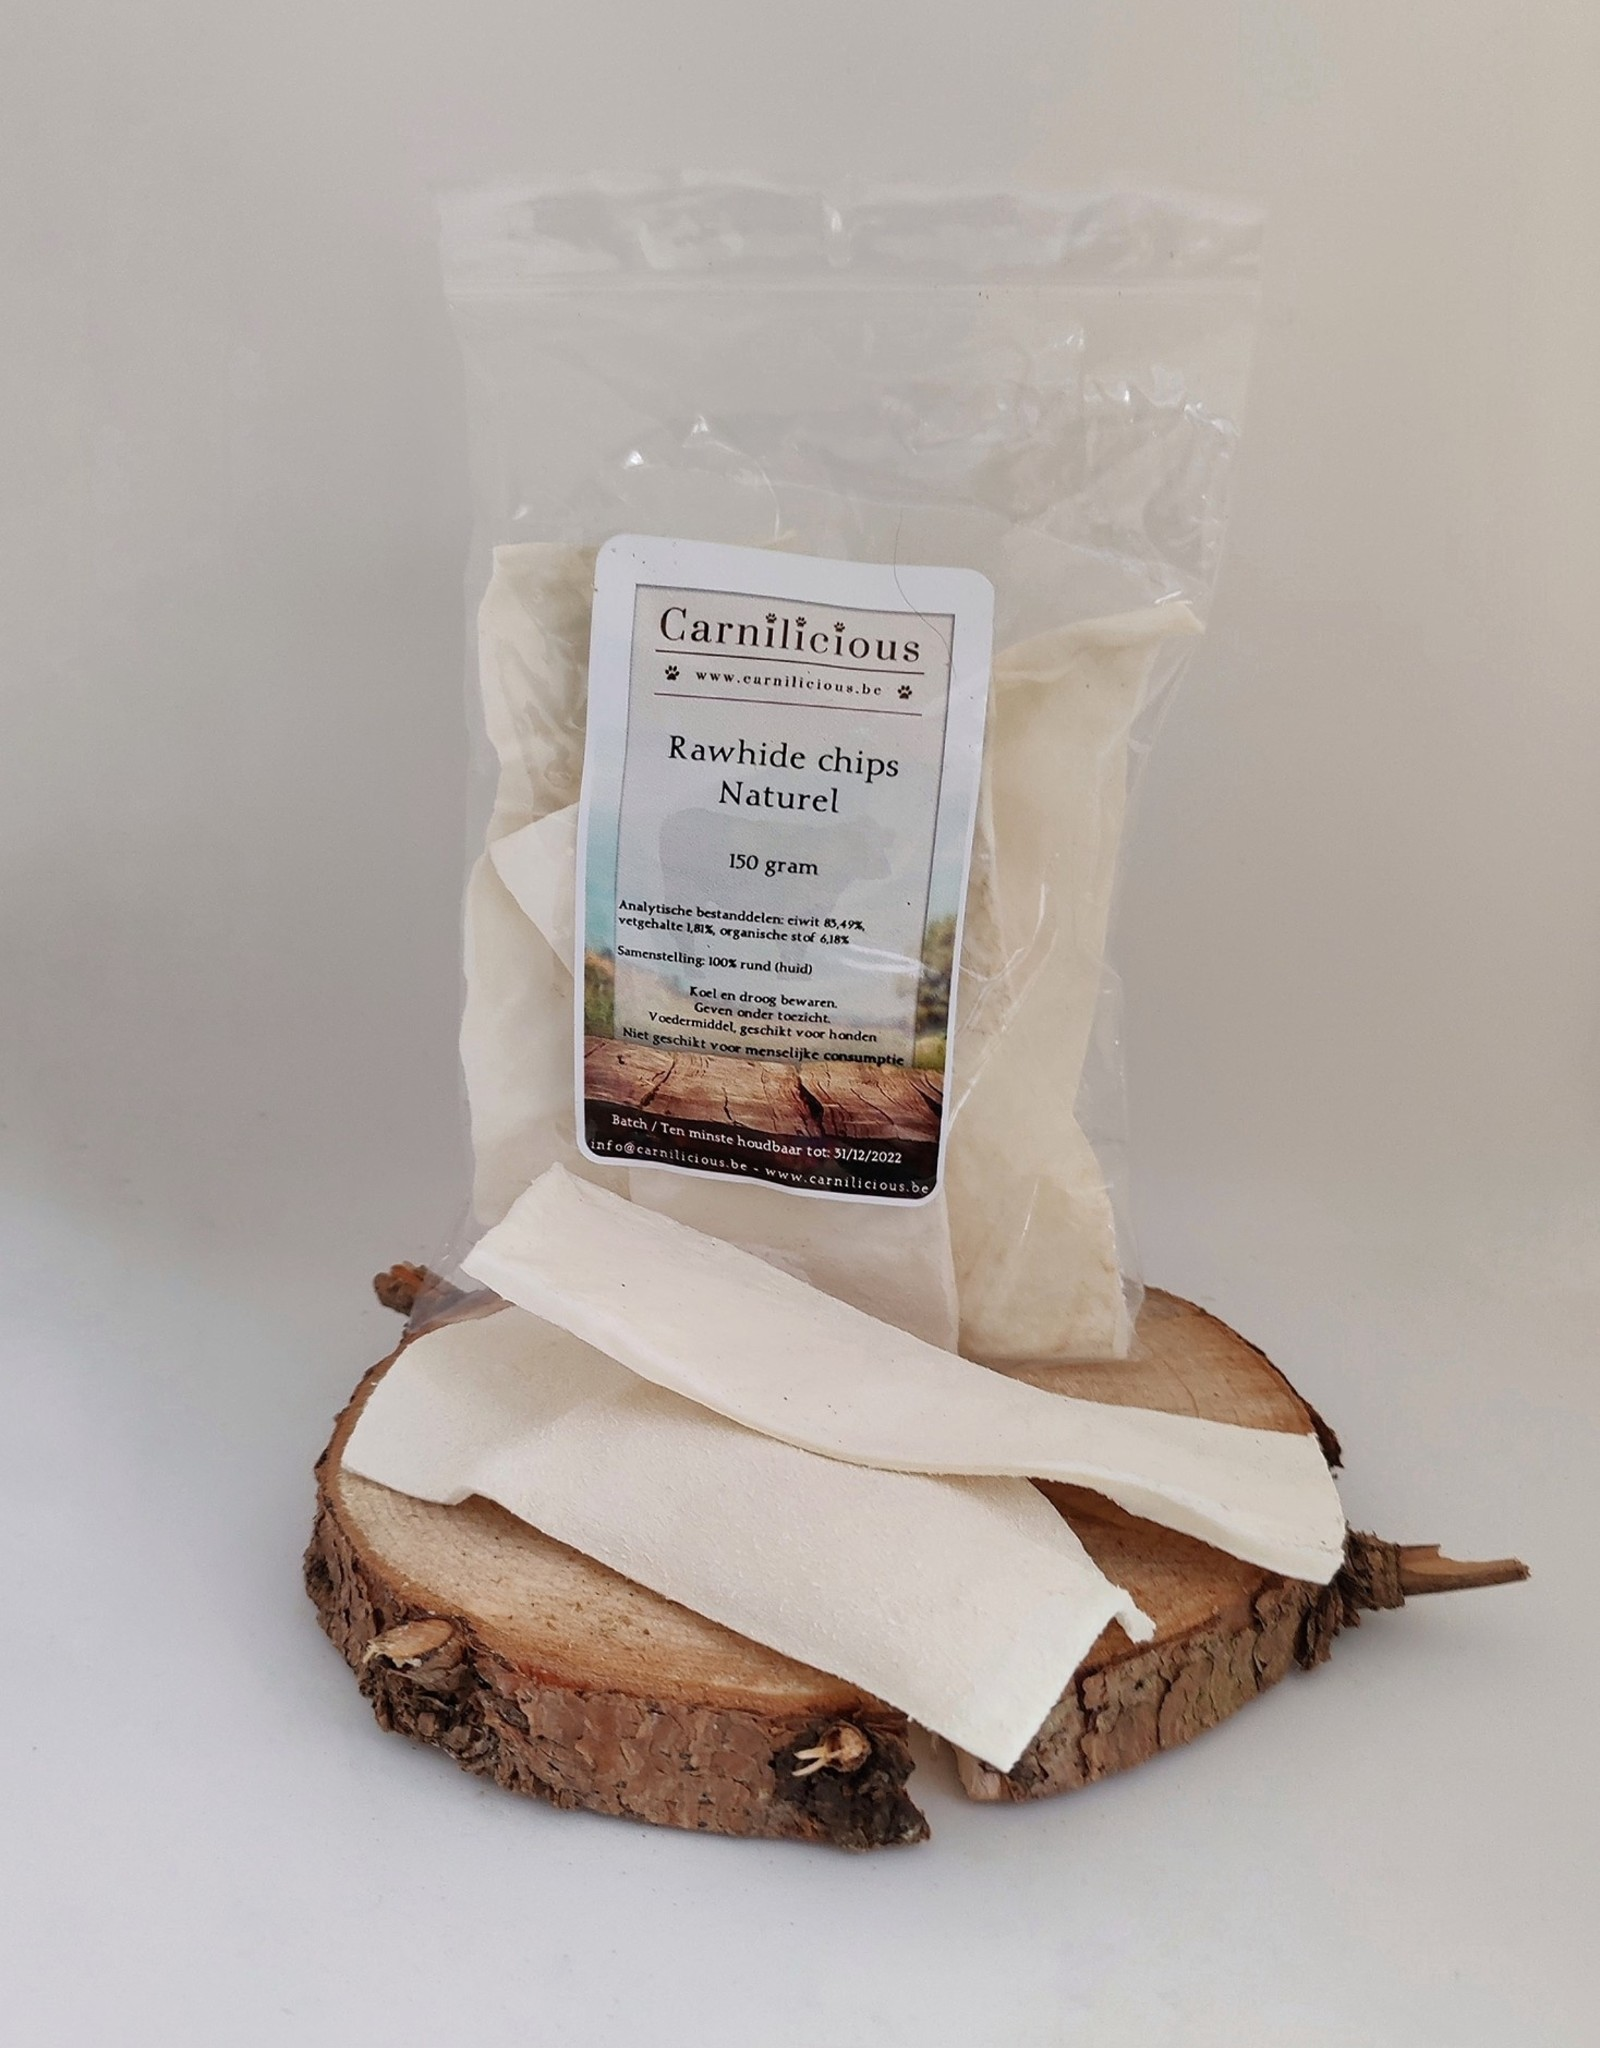 Carnilicious rawhide chips naturel